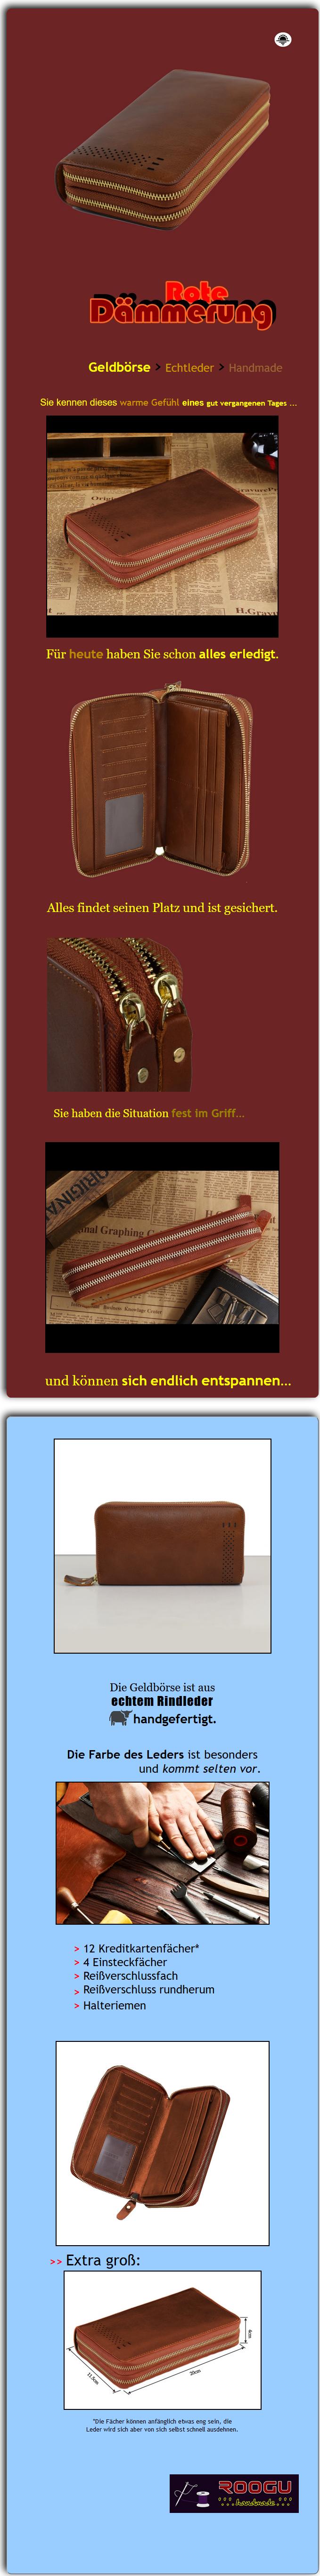 http://roogu.com/auction/de/rotedaemmerung.png